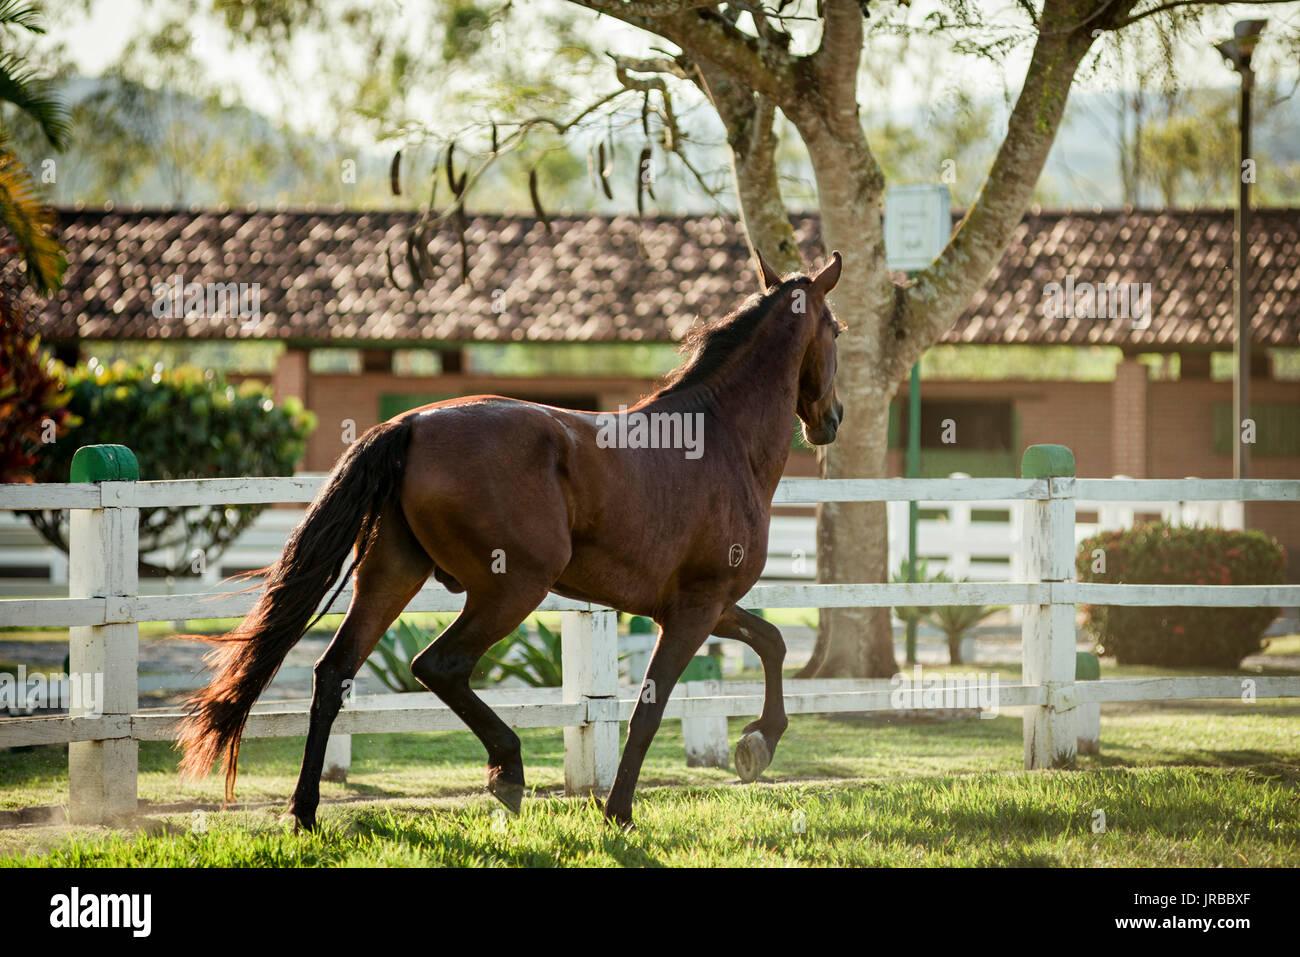 Mangalarga Marchador stallion in Brazil - Stock Image